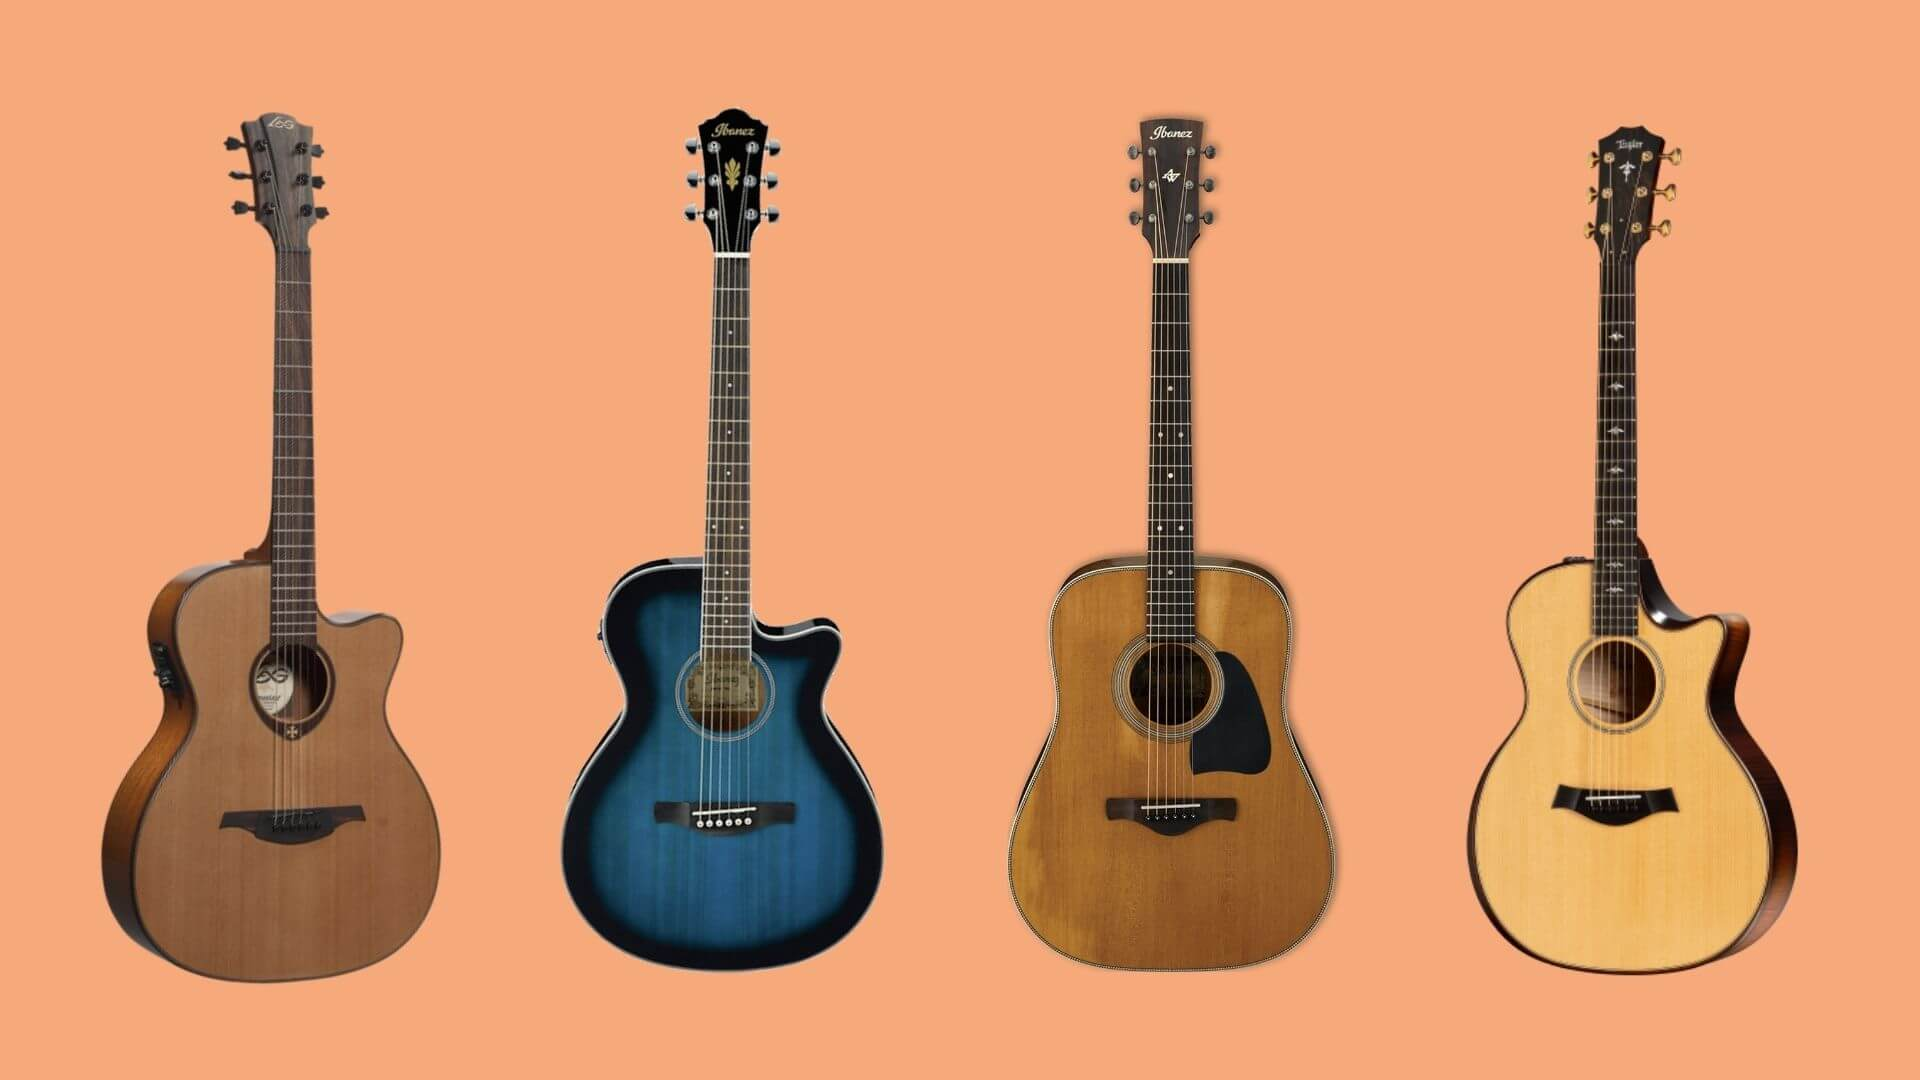 migliore-chitarra-elettroacustica